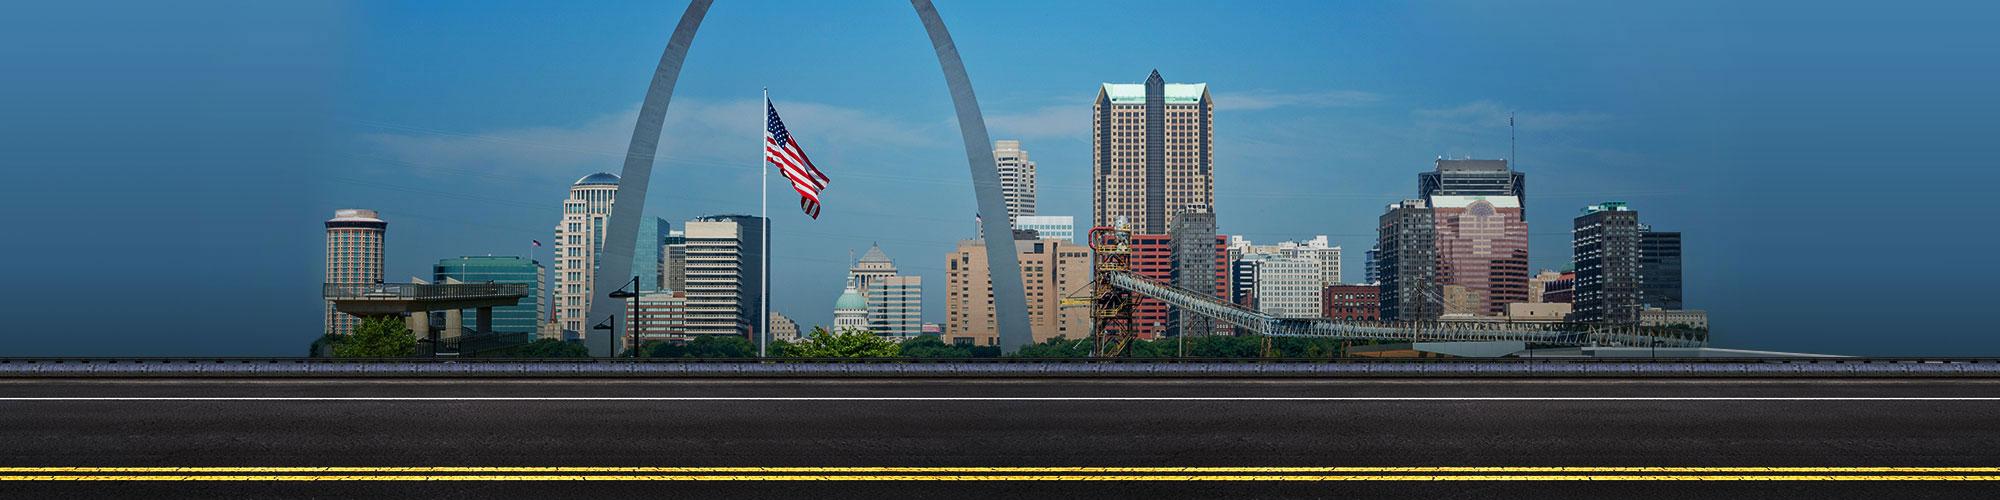 Missouri Arch Road